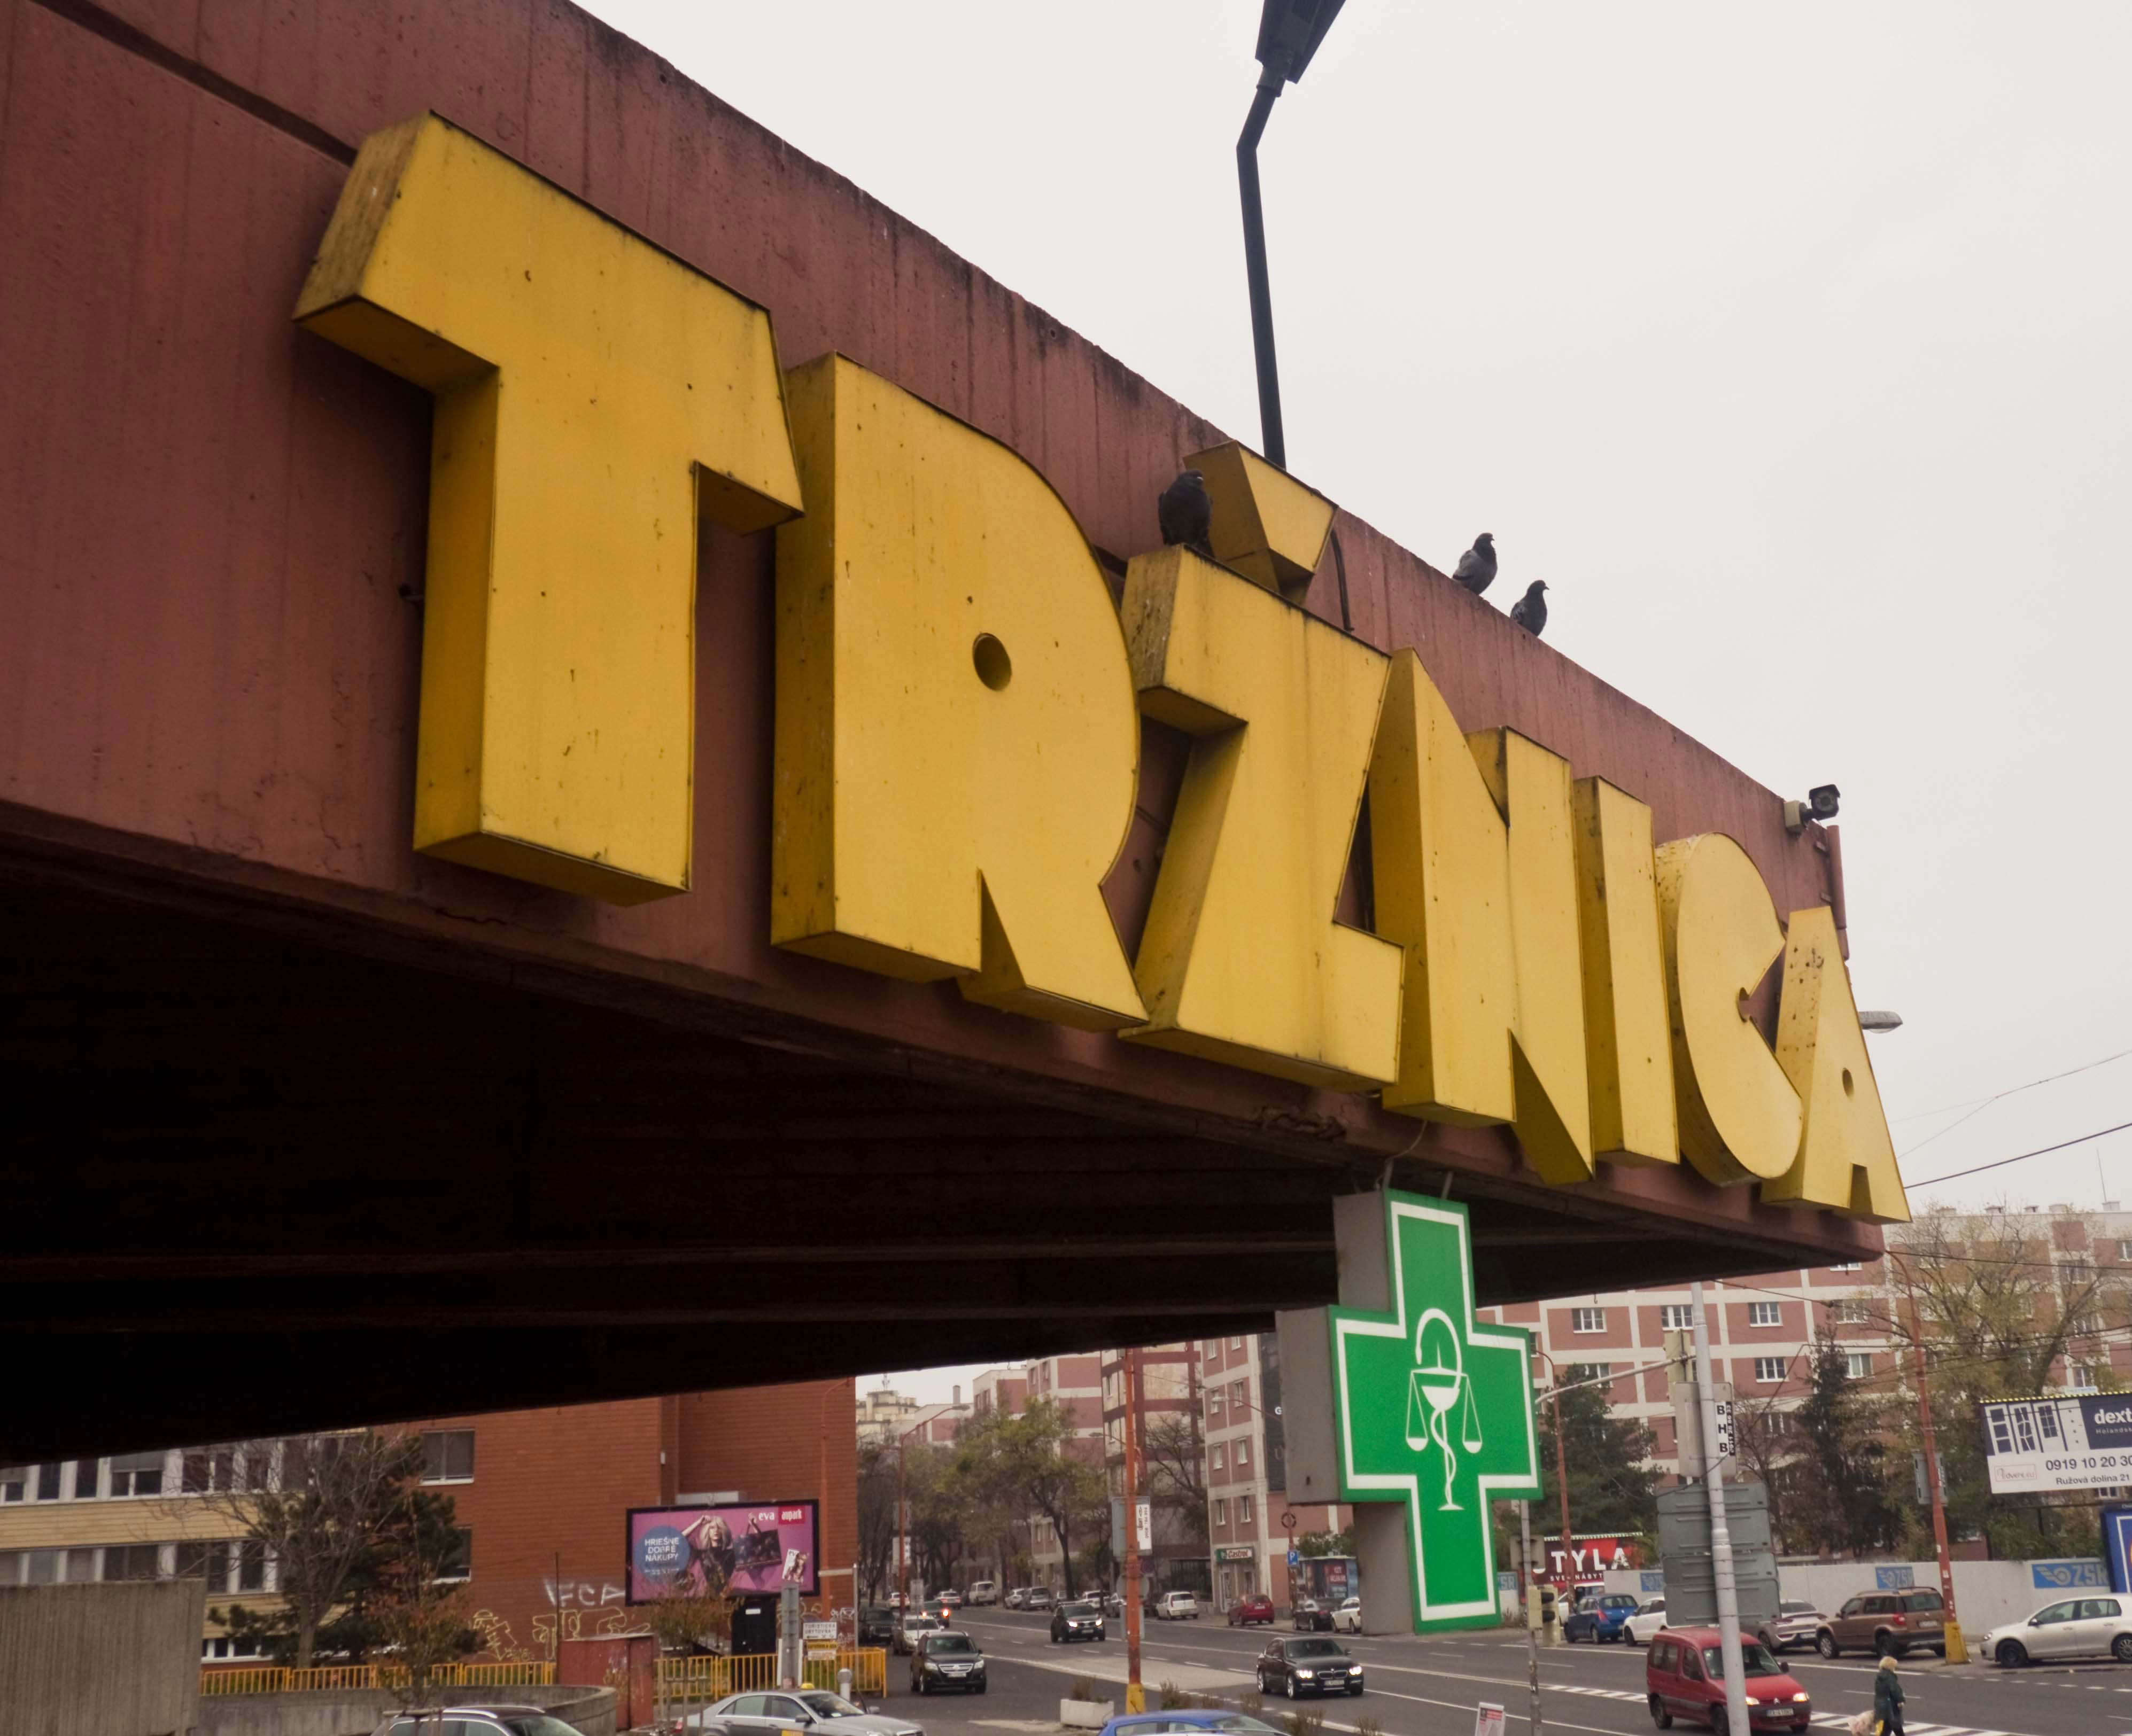 Tržnica market bratislava slovakia